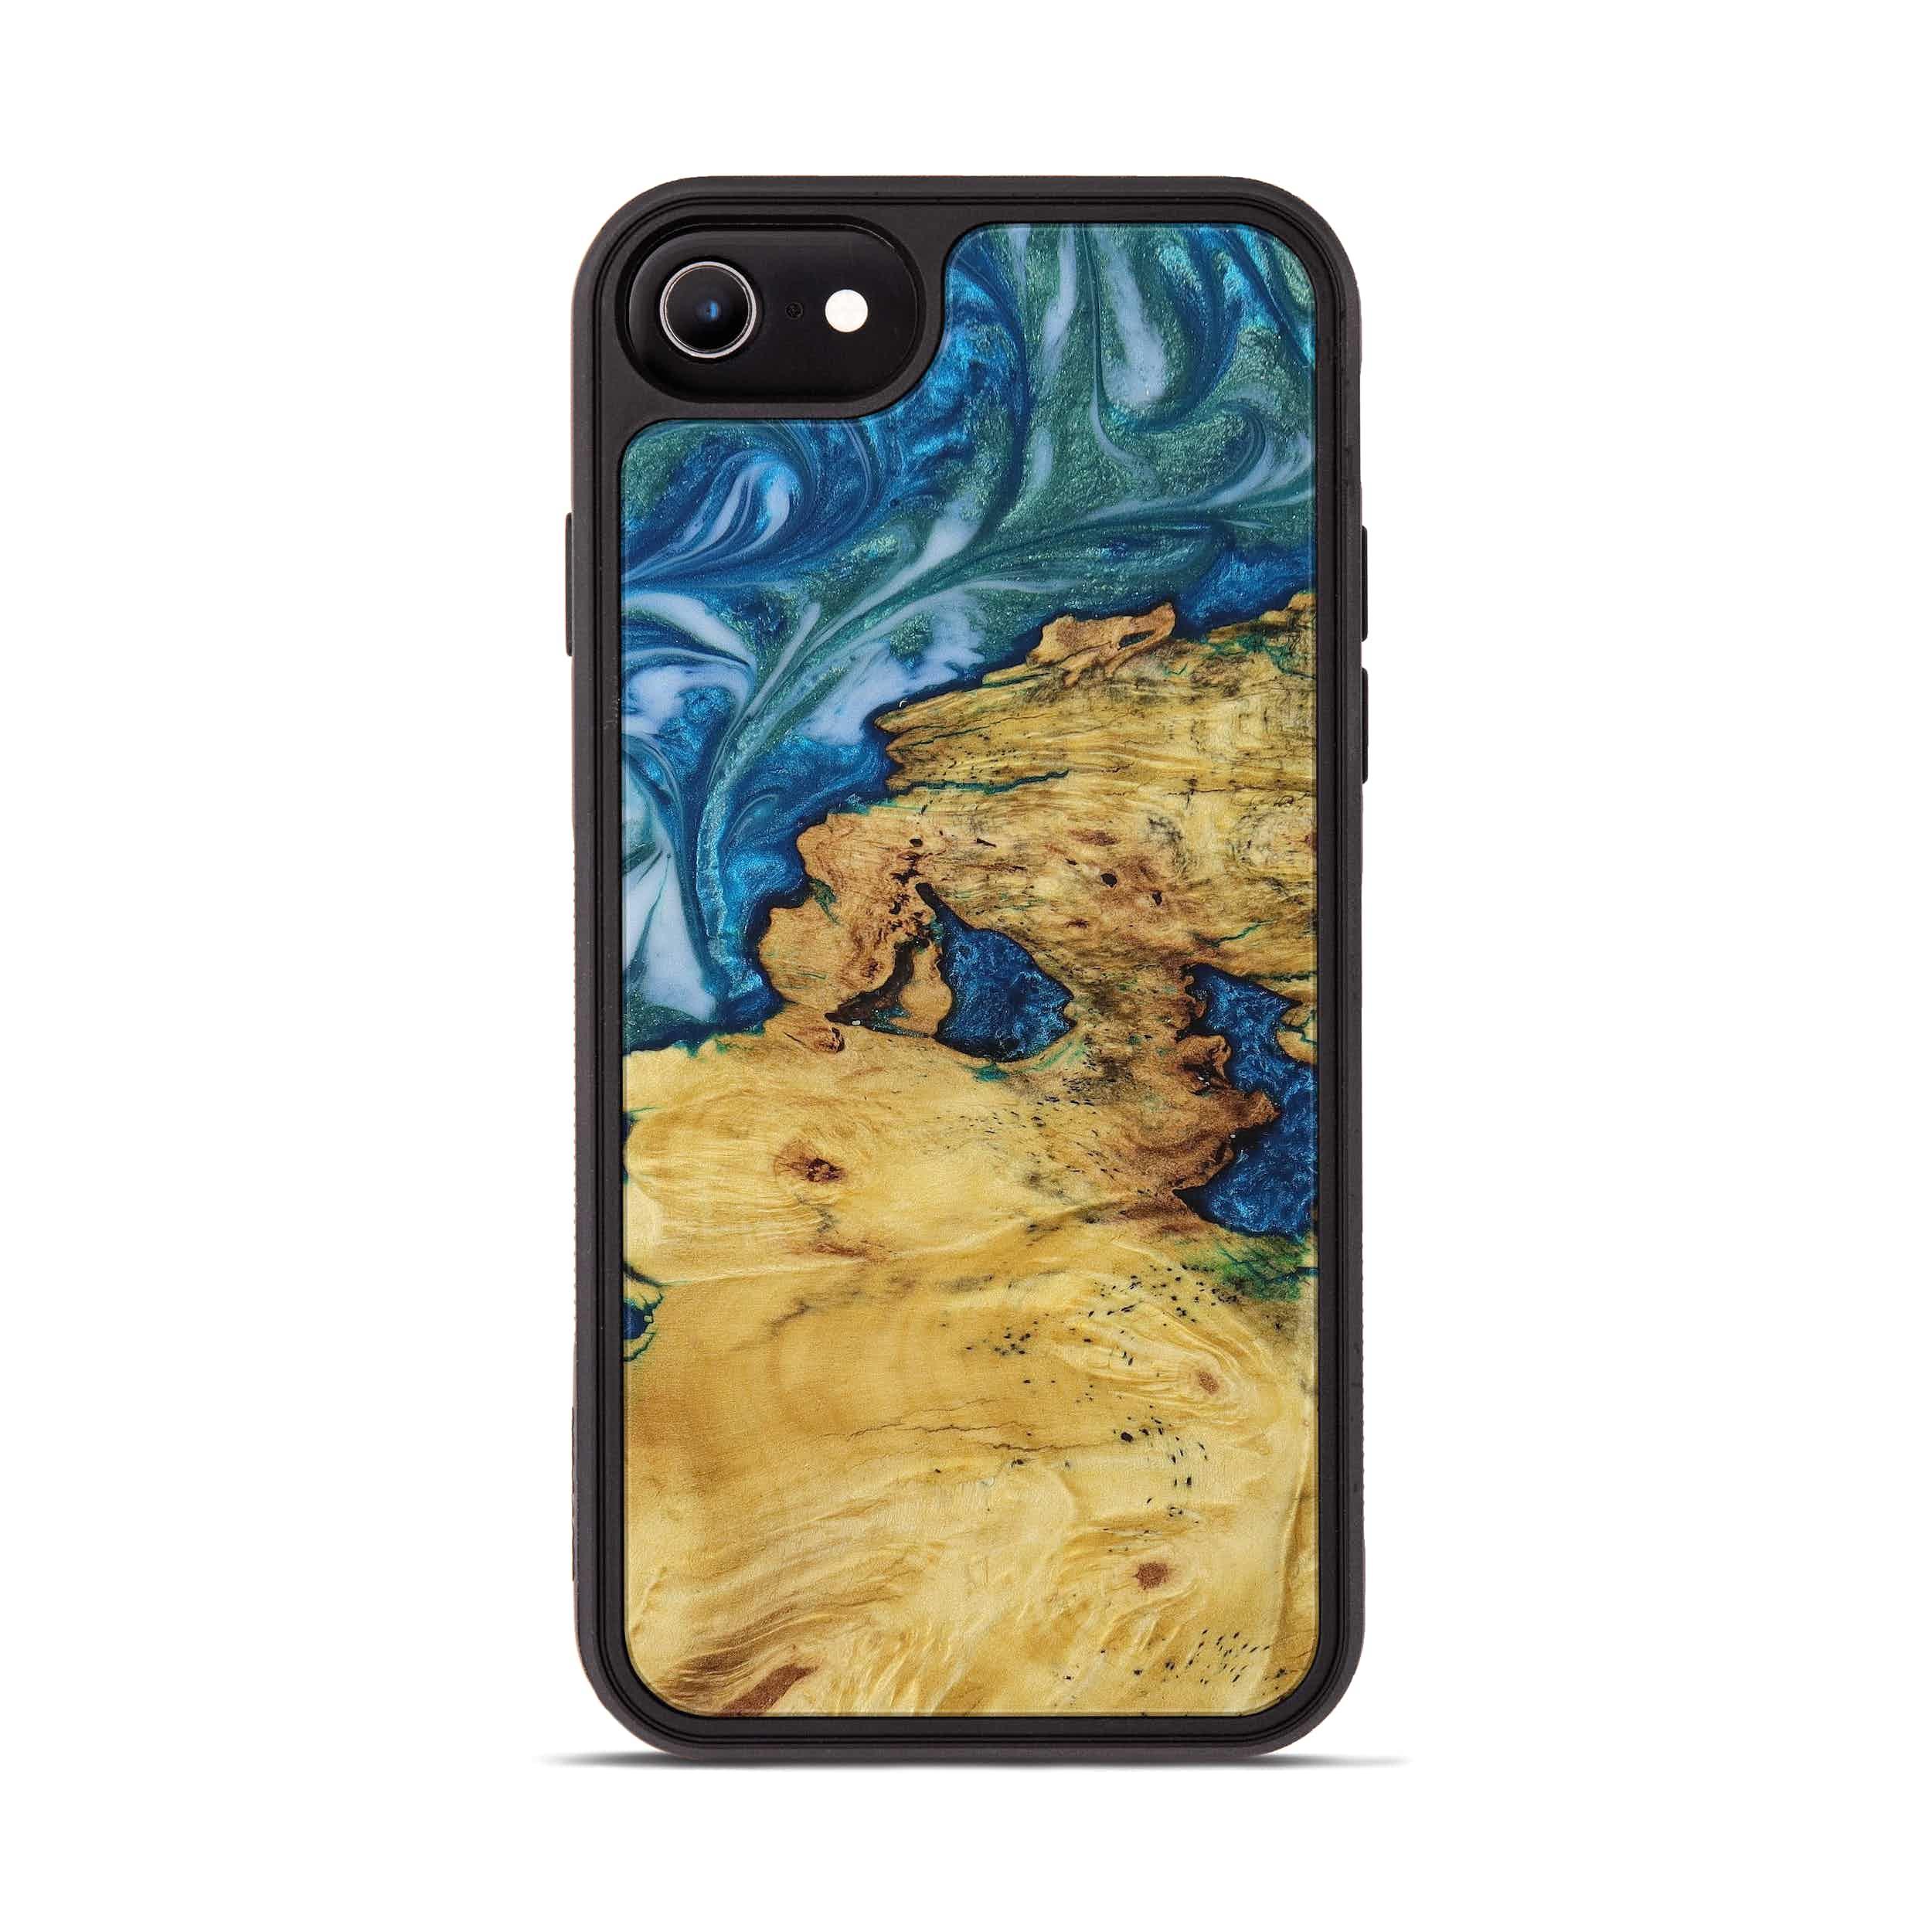 iPhone 8 Wood+Resin Phone Case - Henrietta (Light Blue, 394833)